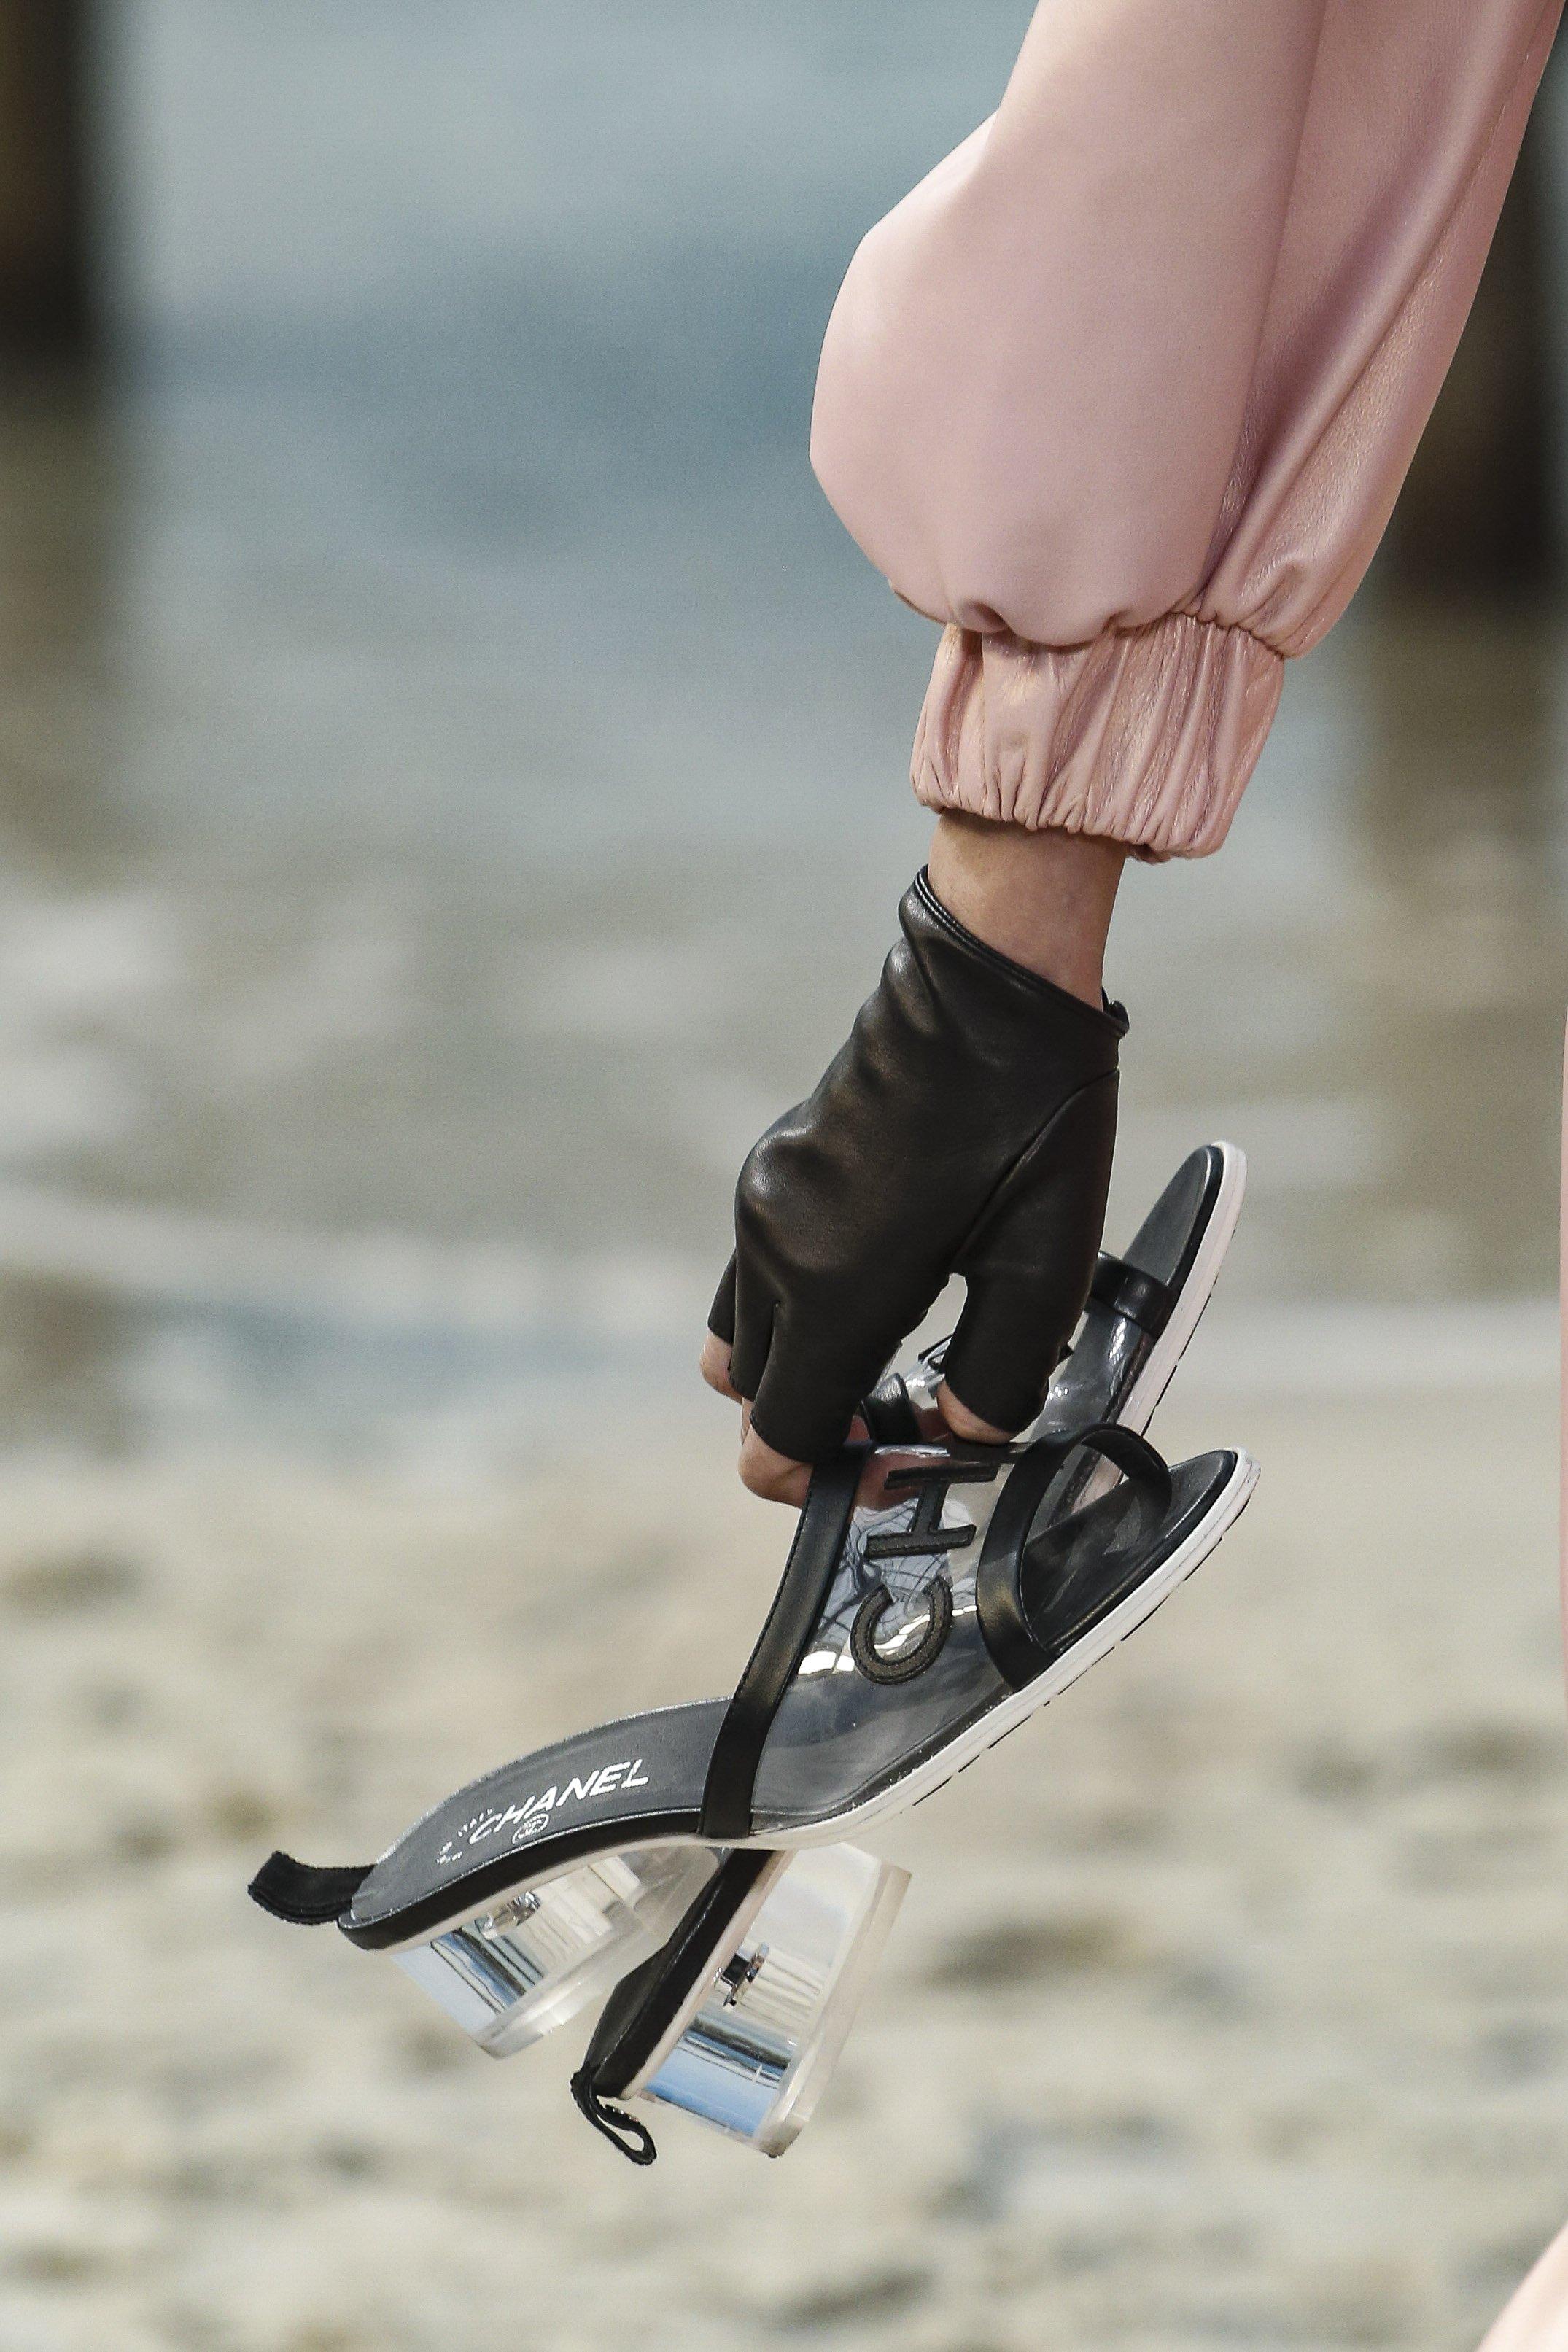 fc3efddeb Balmain shoes حذاء احذية رائجة ربيع 2019 plastic احذية بلاستيكية شانيل  chanel